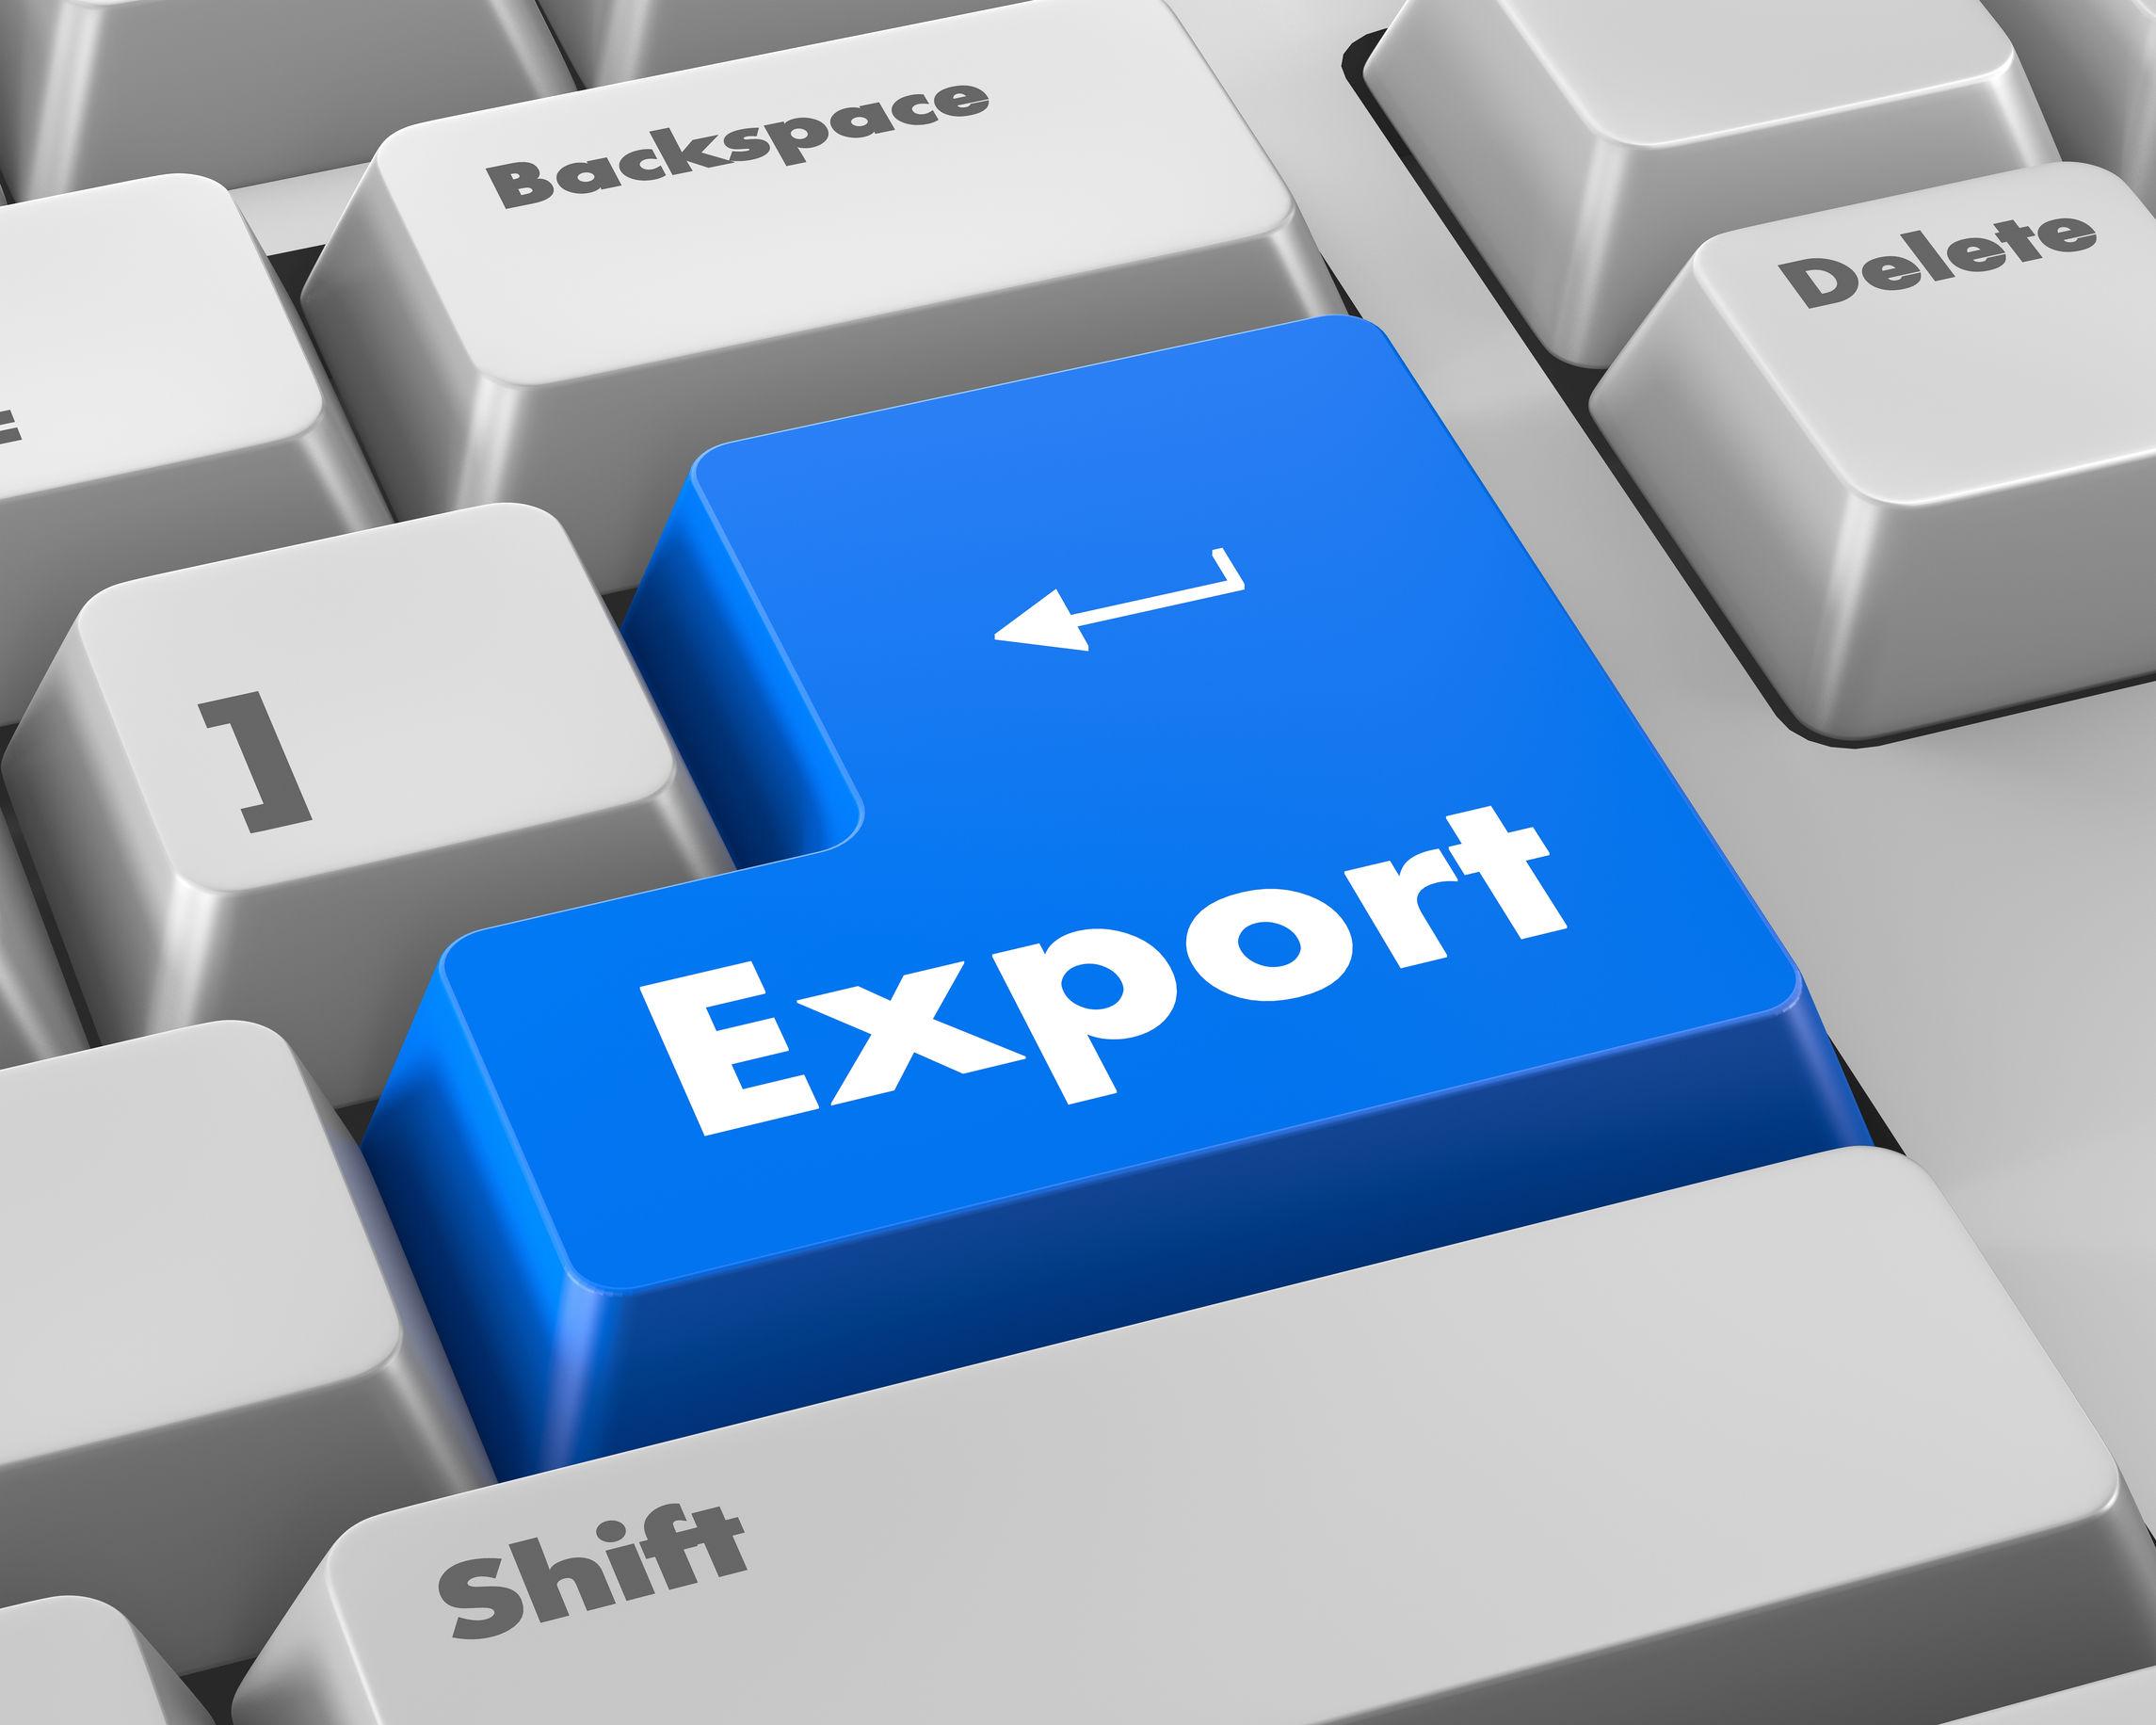 http://www.lstransport.fr/wp-content/uploads/2014/03/export.jpg